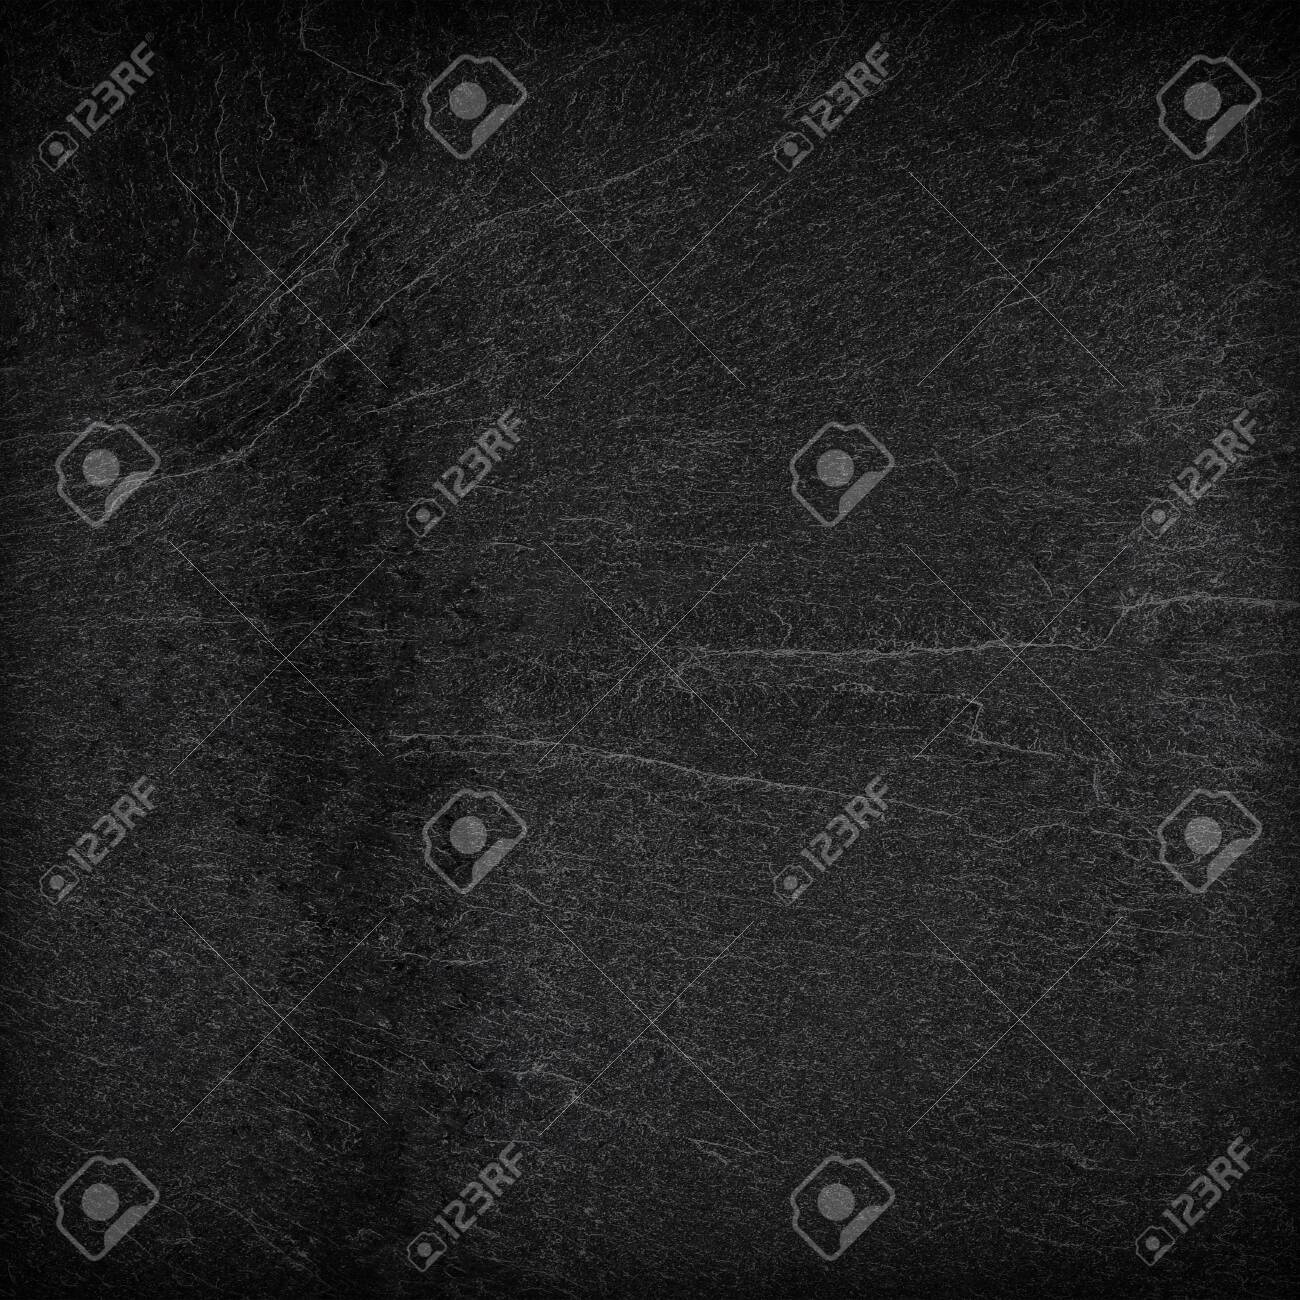 Dark grey black slate background or texture. - 135708983